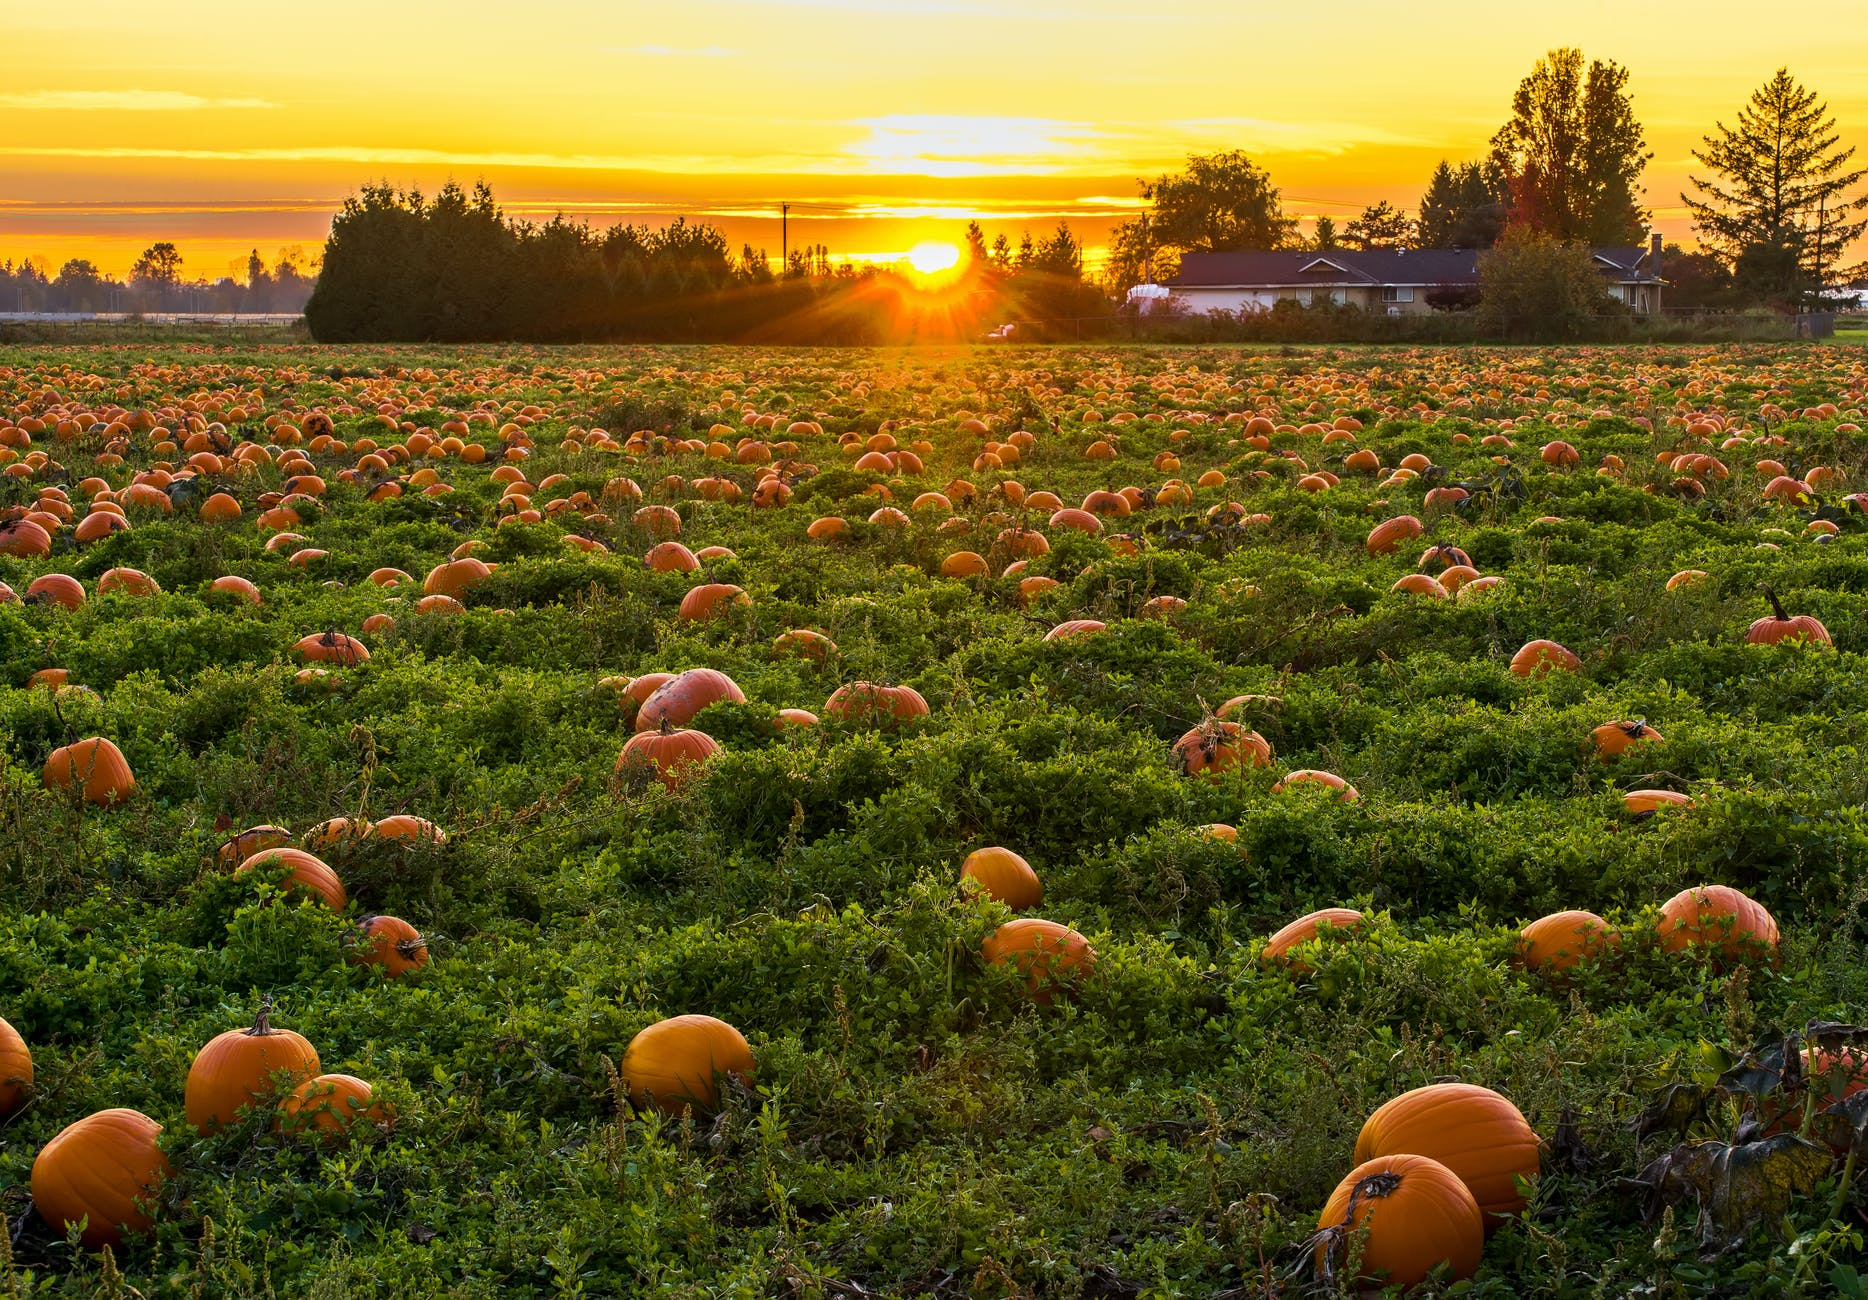 photo of field full of pumpkins